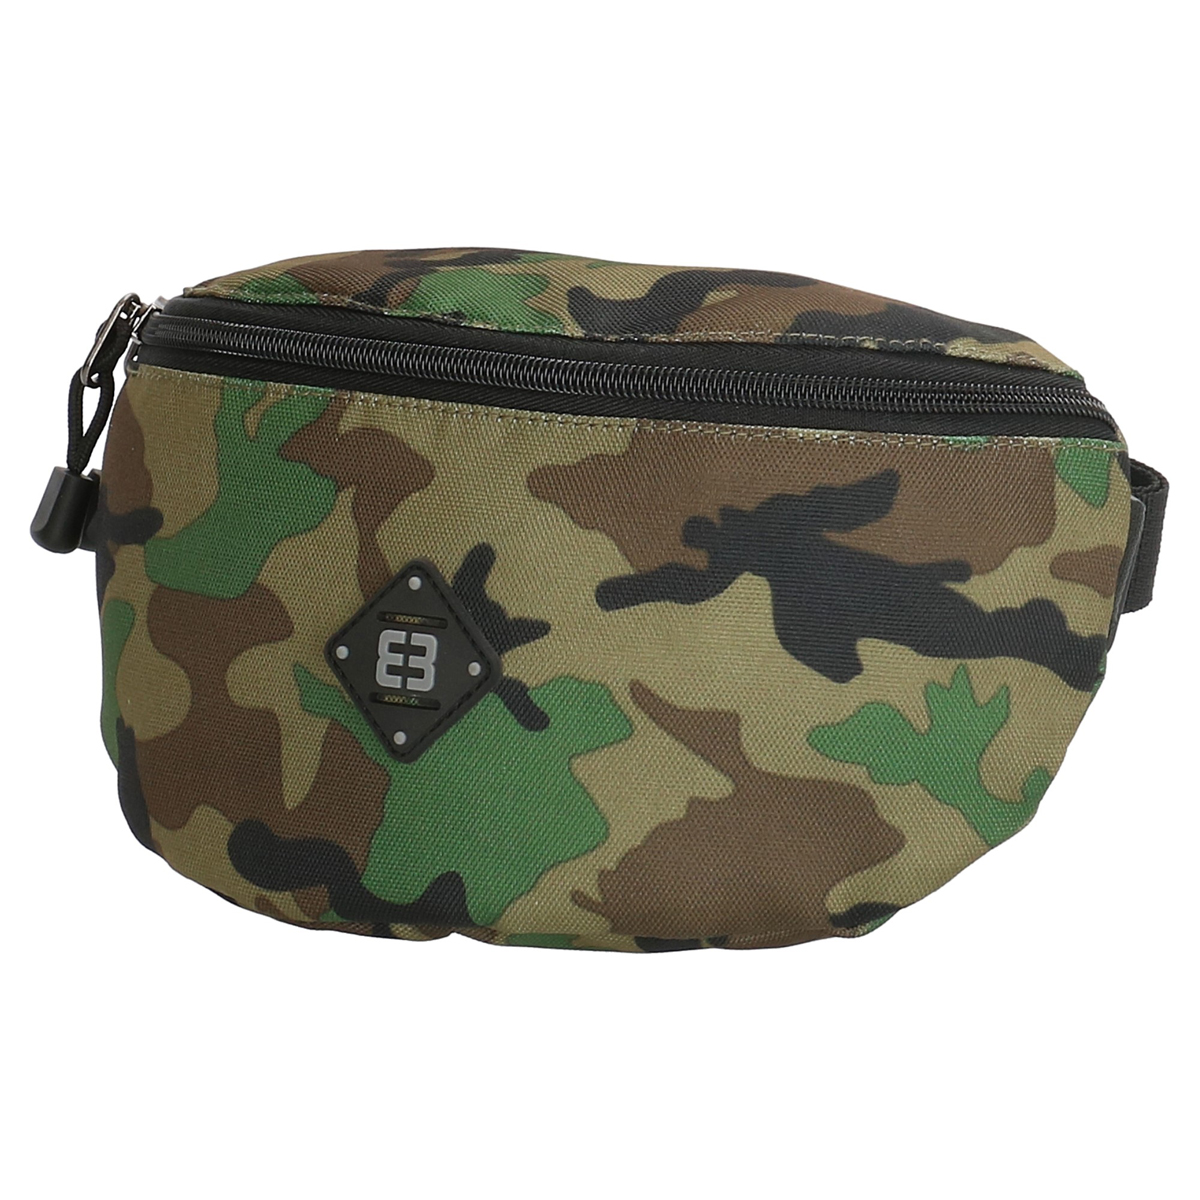 Pochette ceinture / banane \'Enrico Benetti\' vert camouflage - 23x15x4 cm - [Q1739]